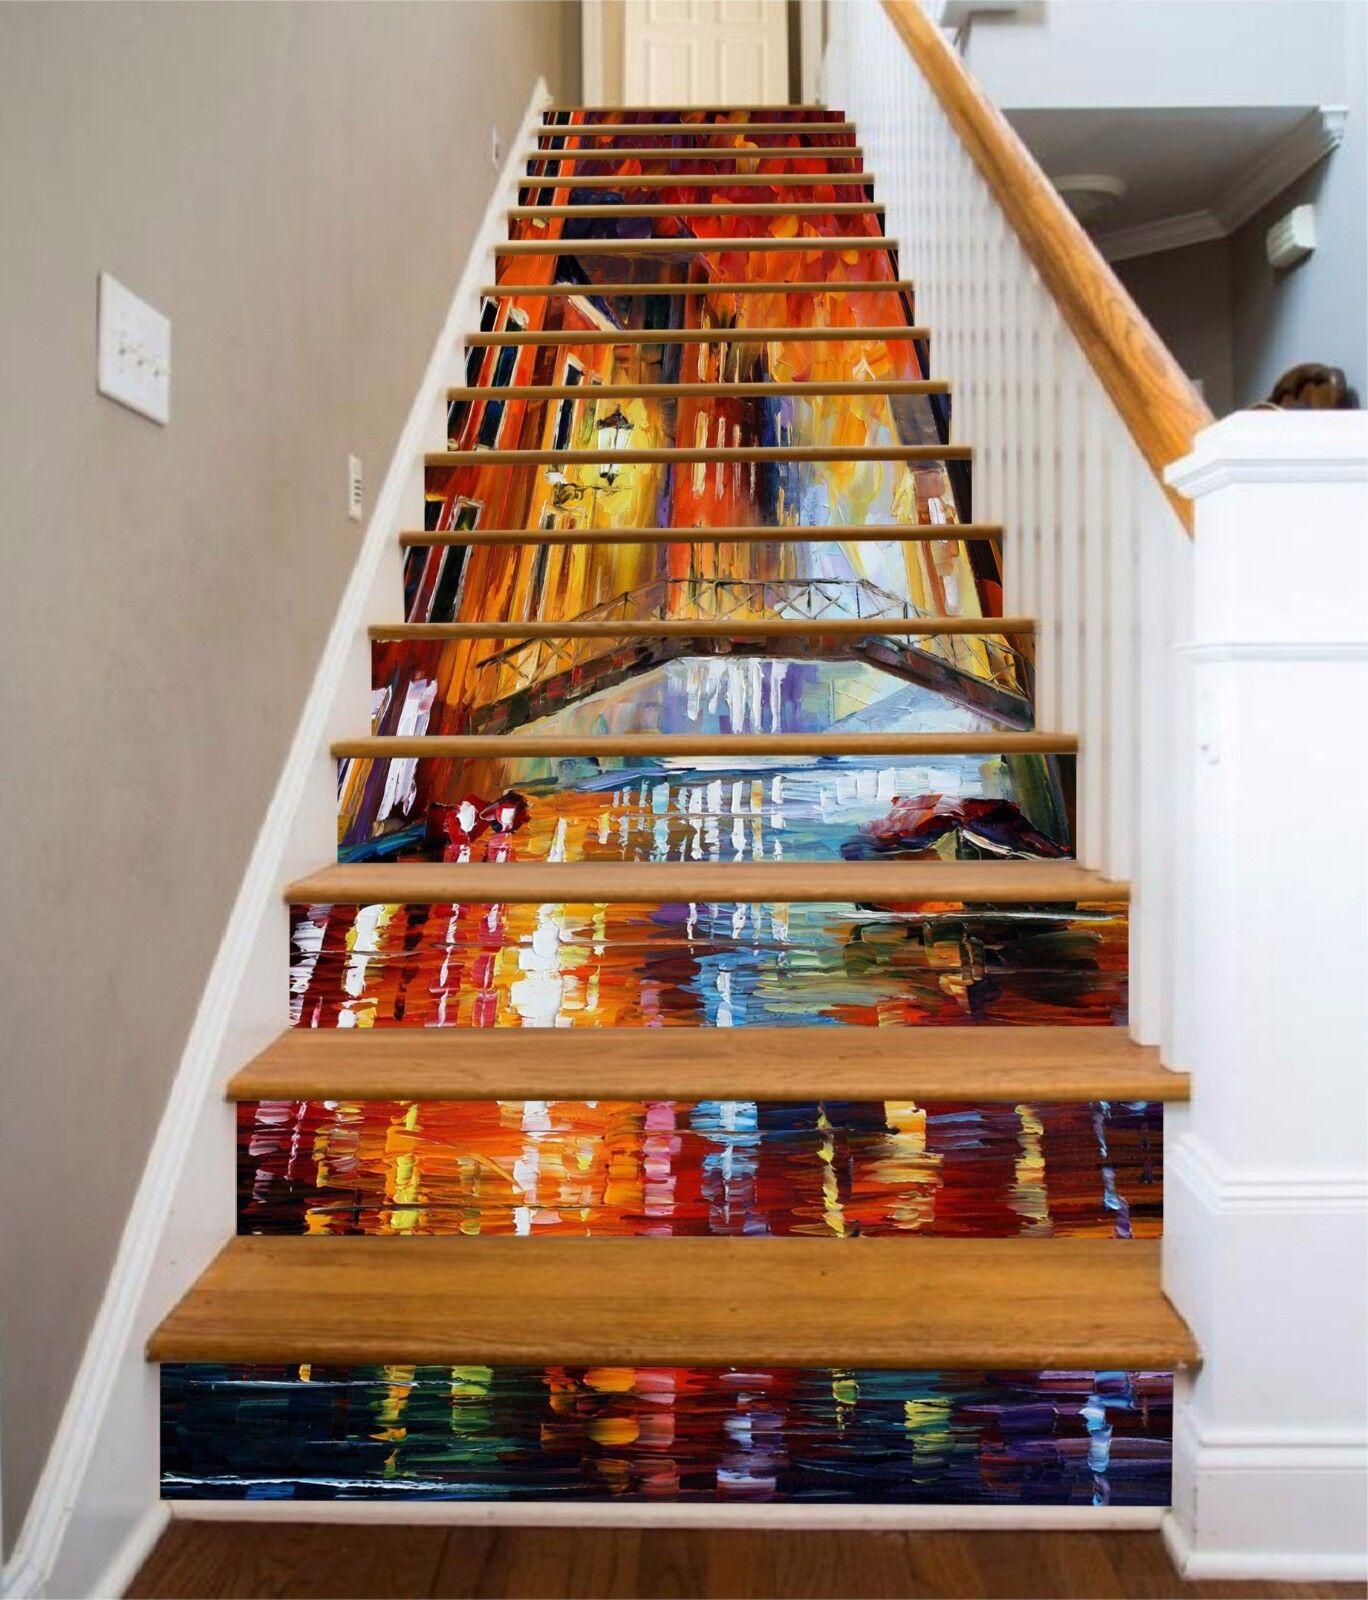 3D City night scene Stair Risers Decoration Photo Mural Vinyl Decal Wallpaper AU